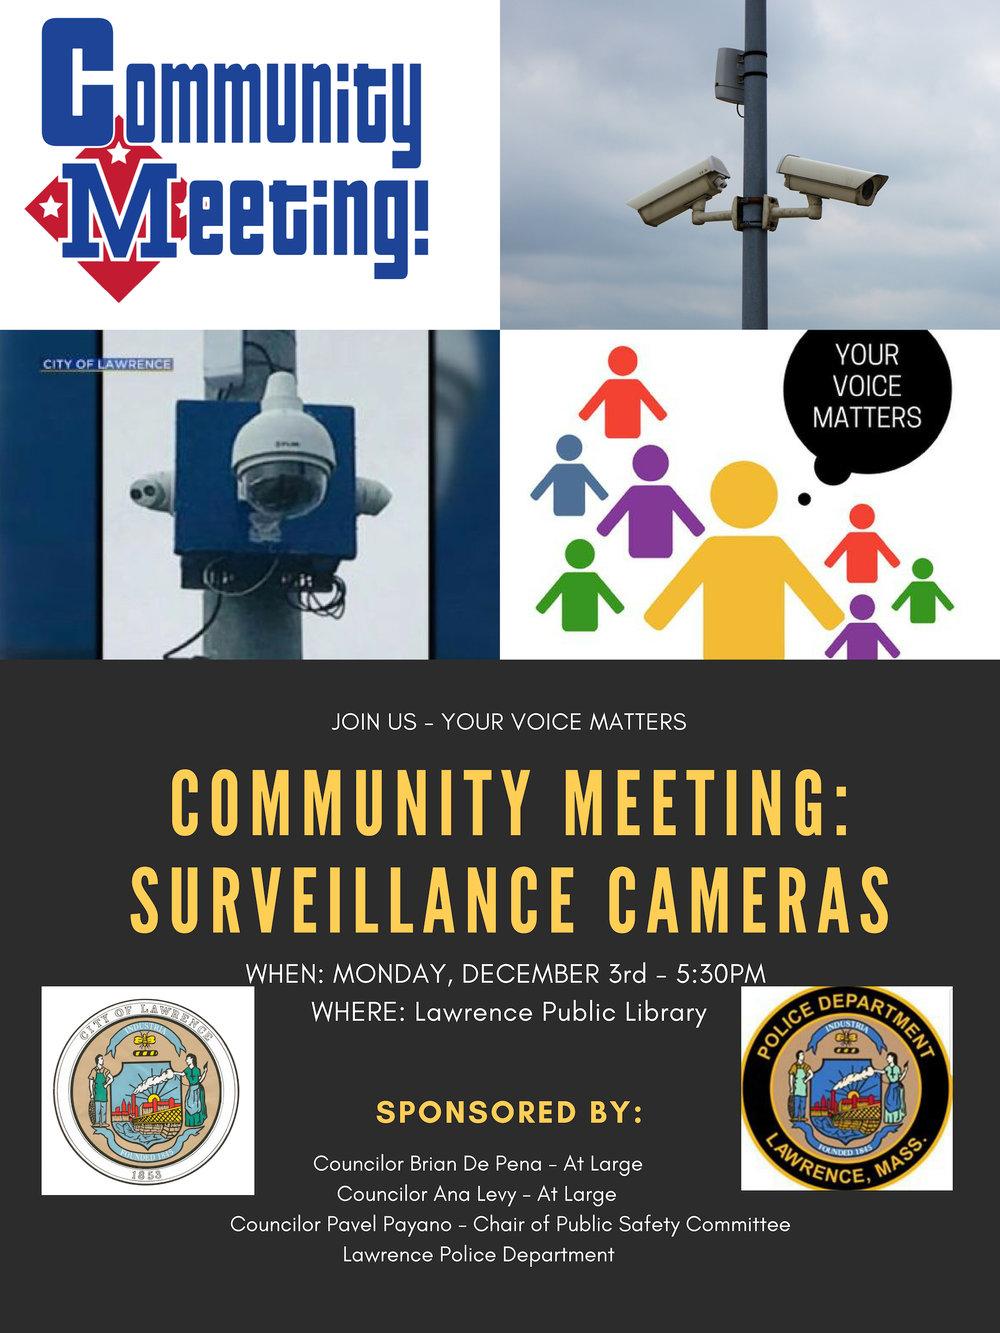 Surveillance Cameras Community Meeting.jpg